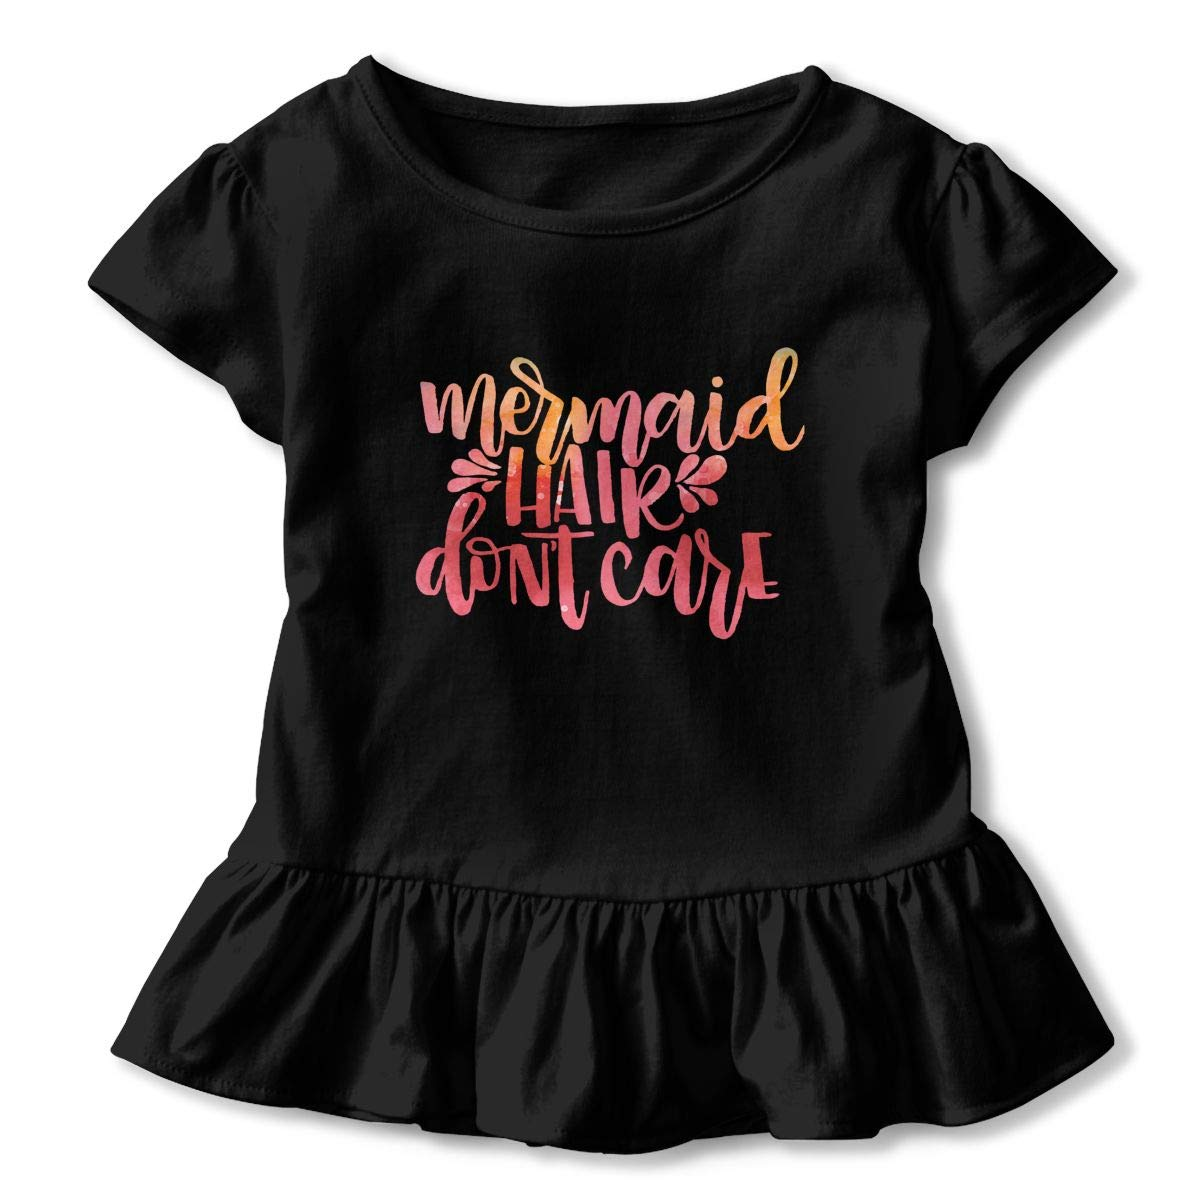 Mermaid Hair Dont Care Toddler Baby Girls Short Sleeve Ruffle T-Shirt